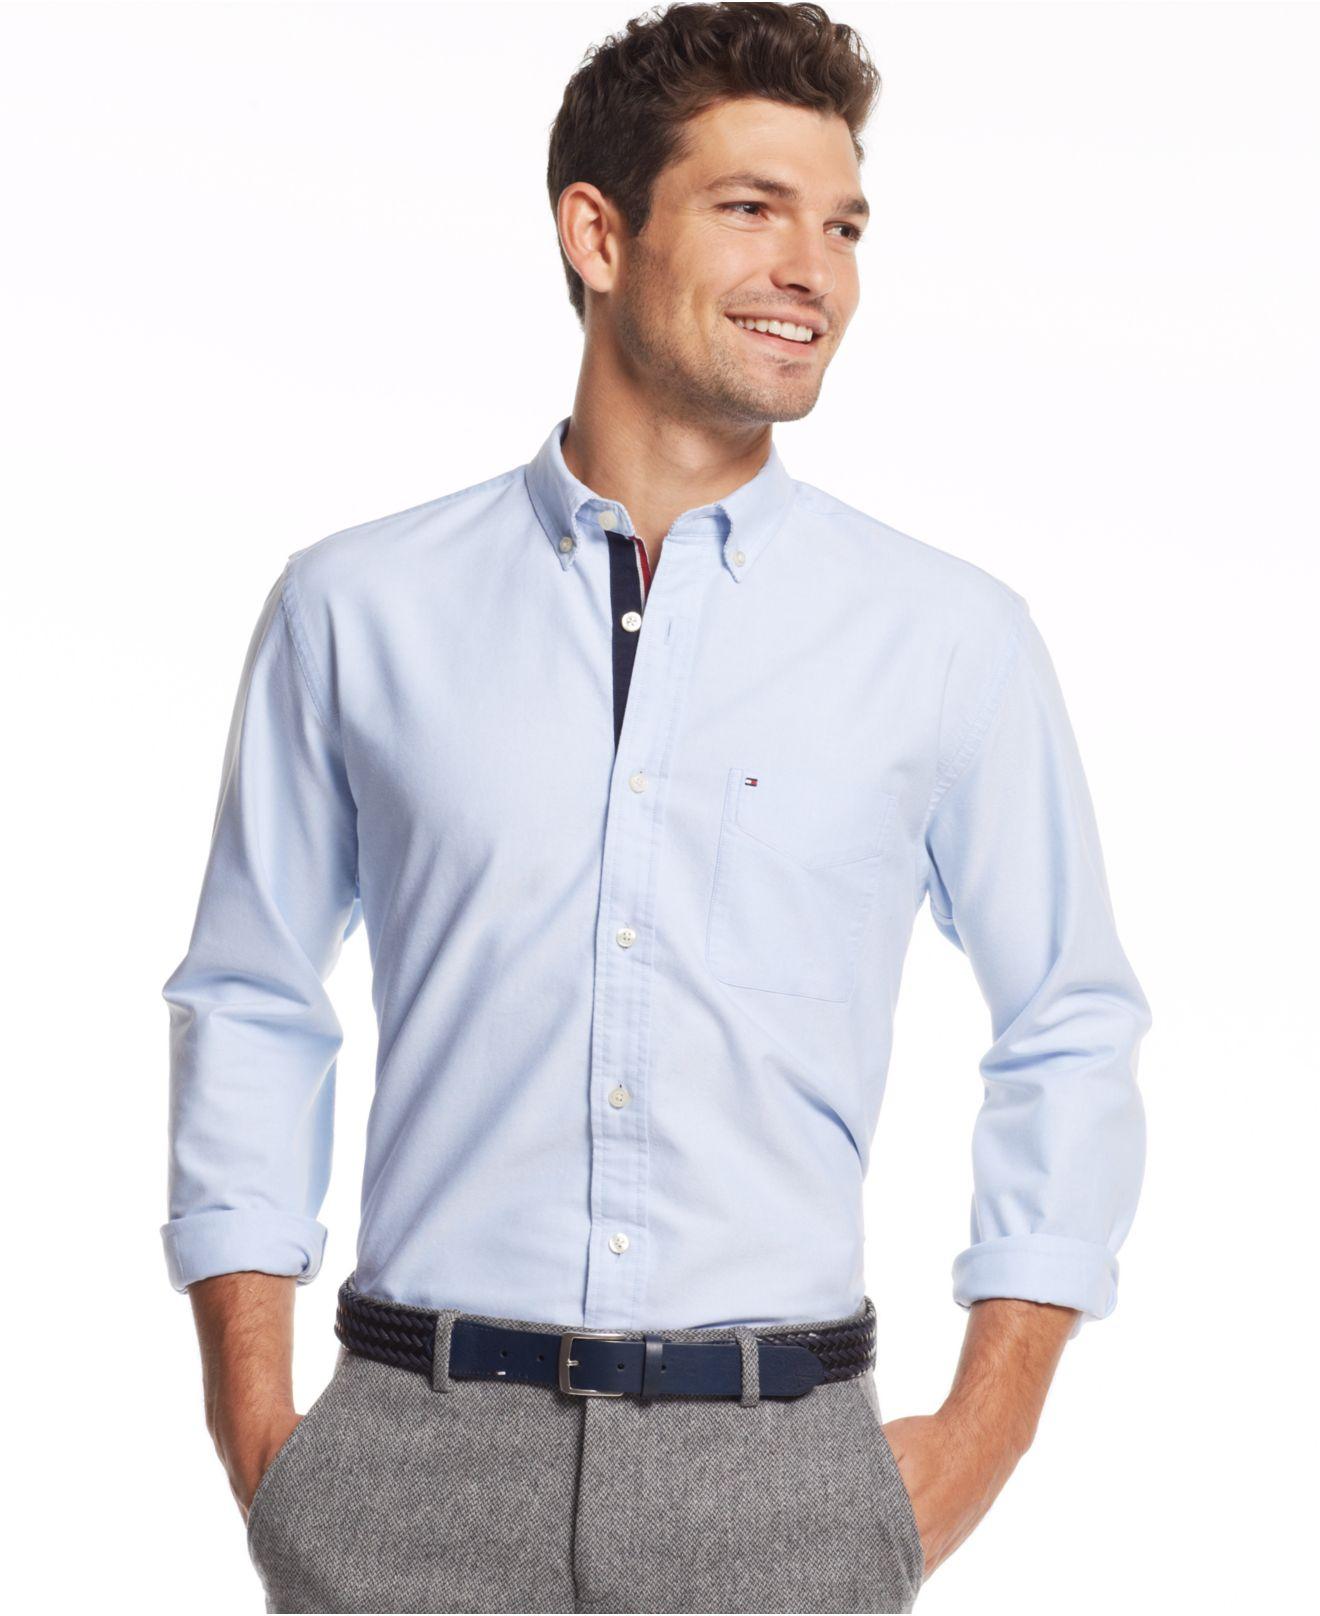 58940bb9d Gallery. Previously sold at  Macy s · Men s Mandarin Collar Shirts Men s Short  Sleeve ...